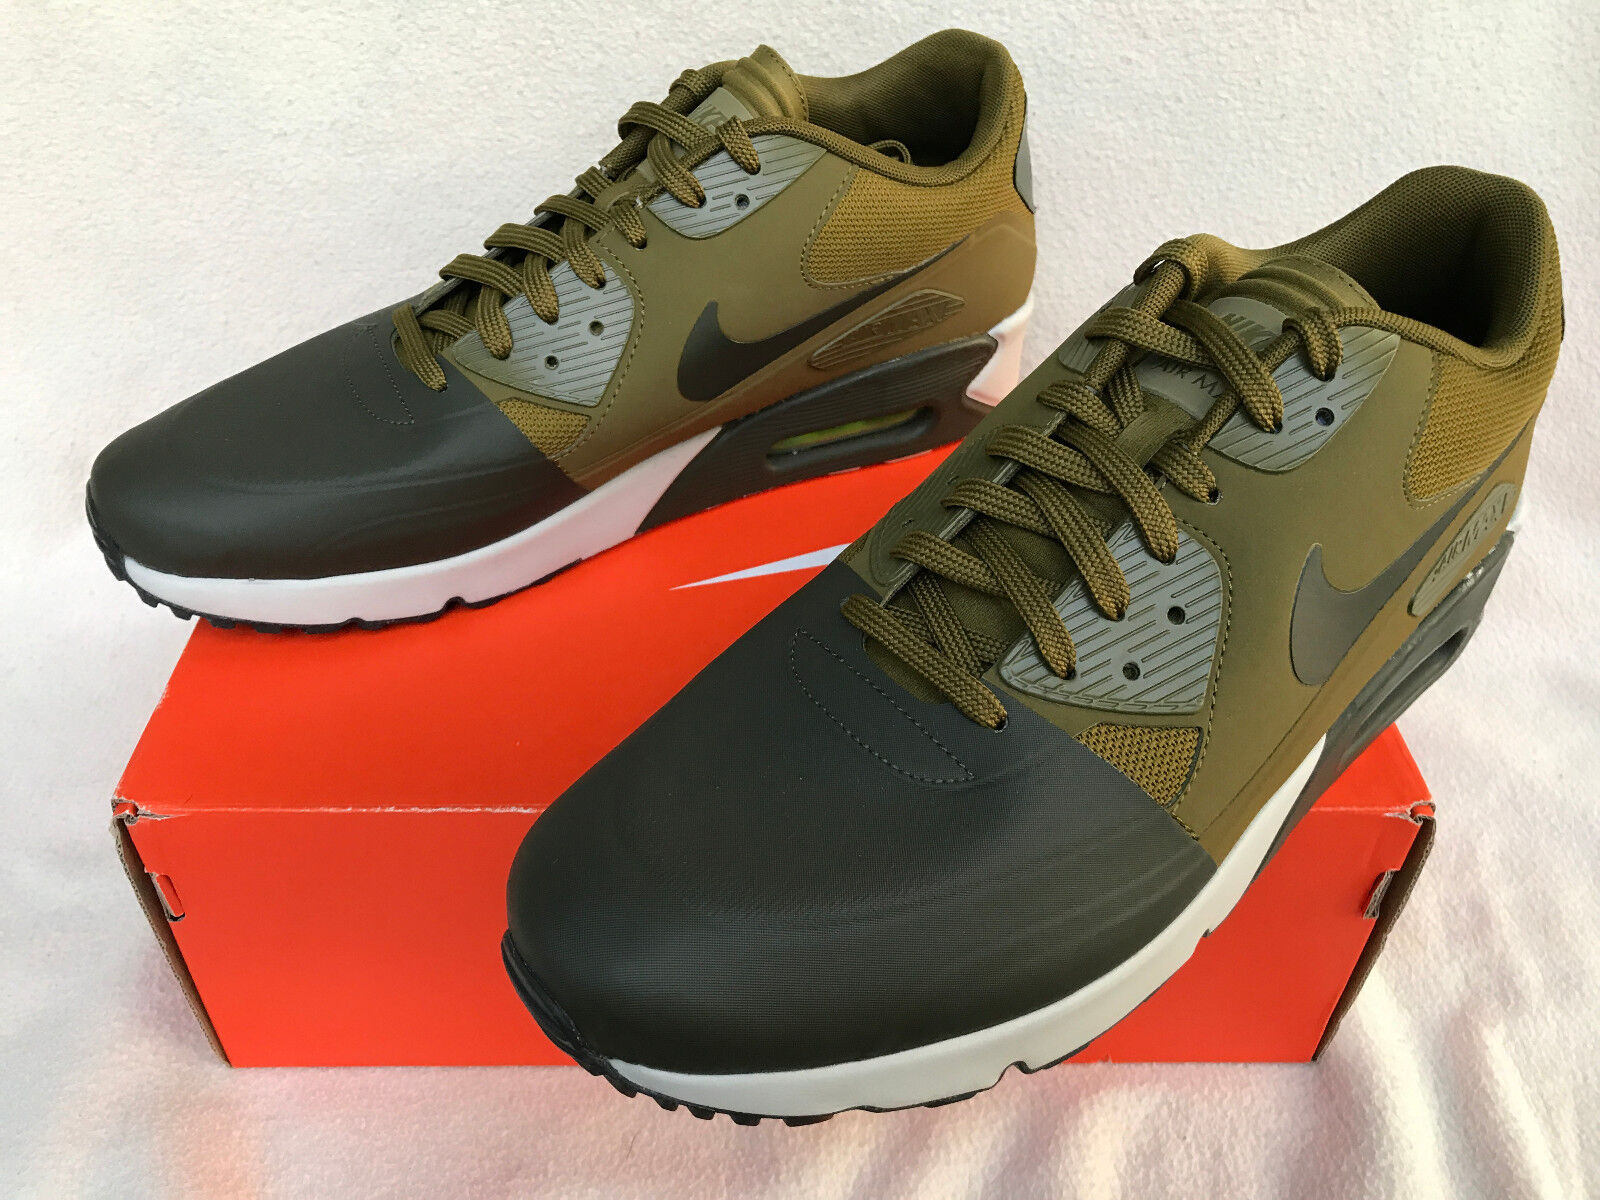 Max Ultra 90 Ultra Max 2.0 Nike Air SE 876005-300 cargo Militia Zapatillas Para Correr Para hombres 12 Nuevo 0f1361